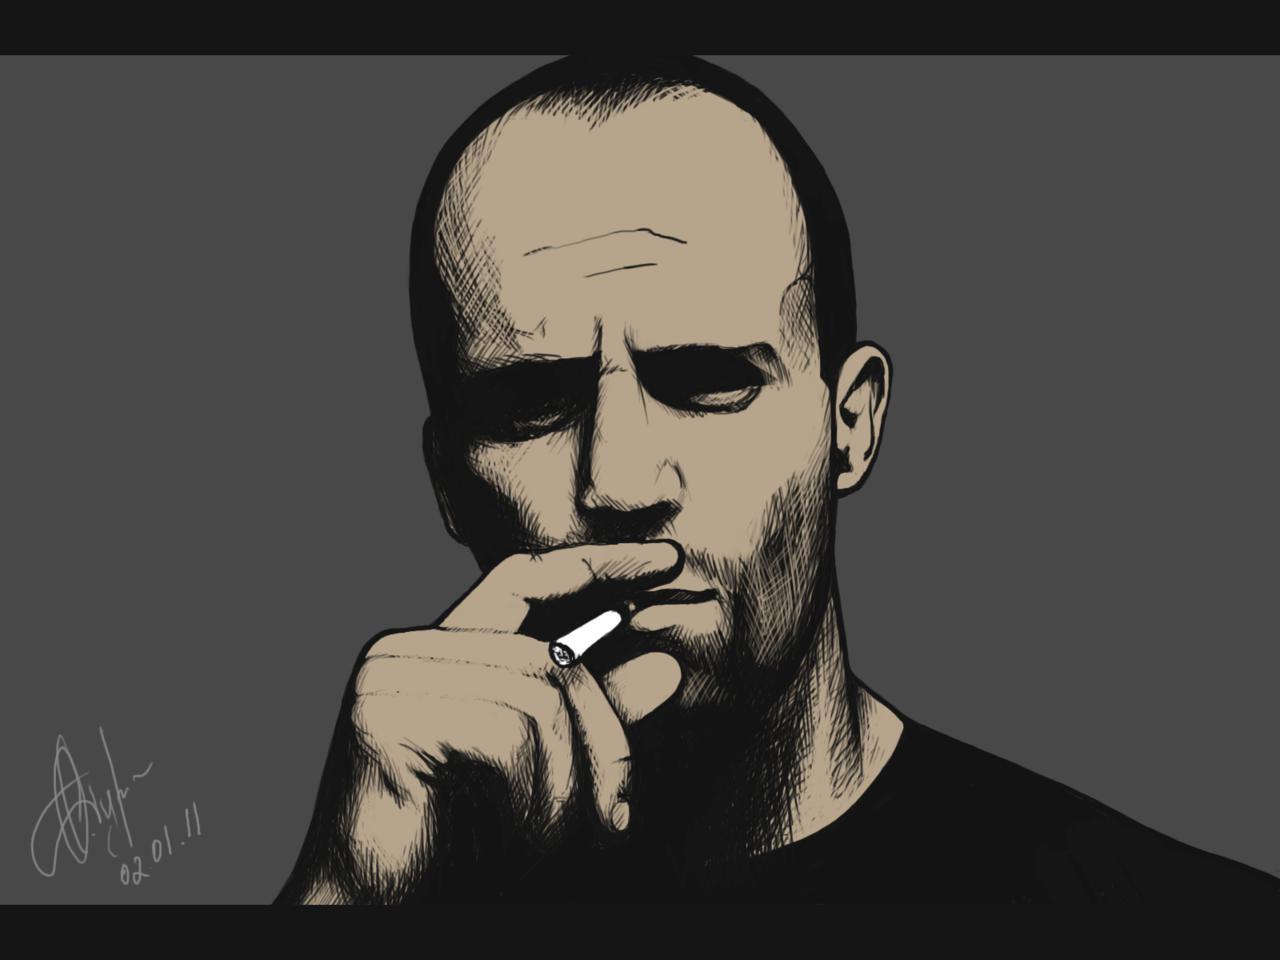 PC-Wallpapers - Free Jason Statham Deskt-PC-Wallpapers - Free Jason Statham Desktop Wallpaper Backgrounds-20